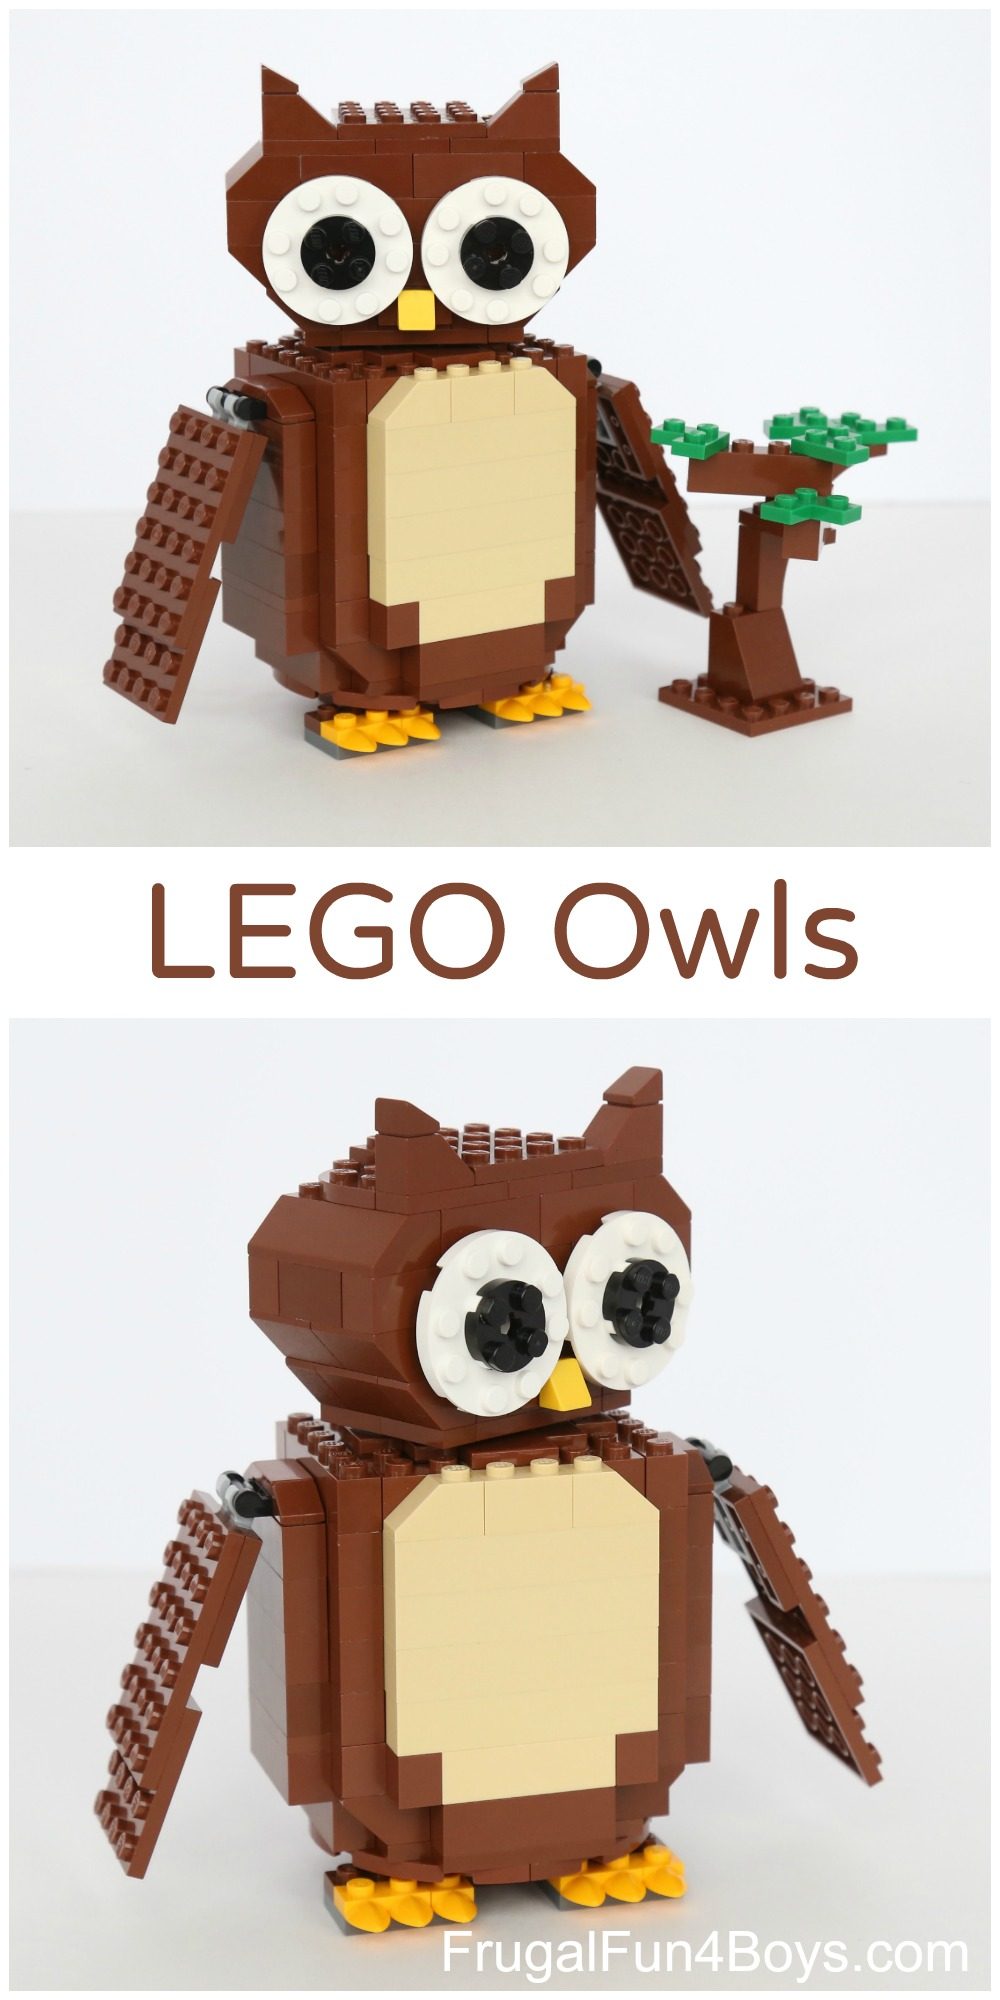 LEGO Owls Building Instructions